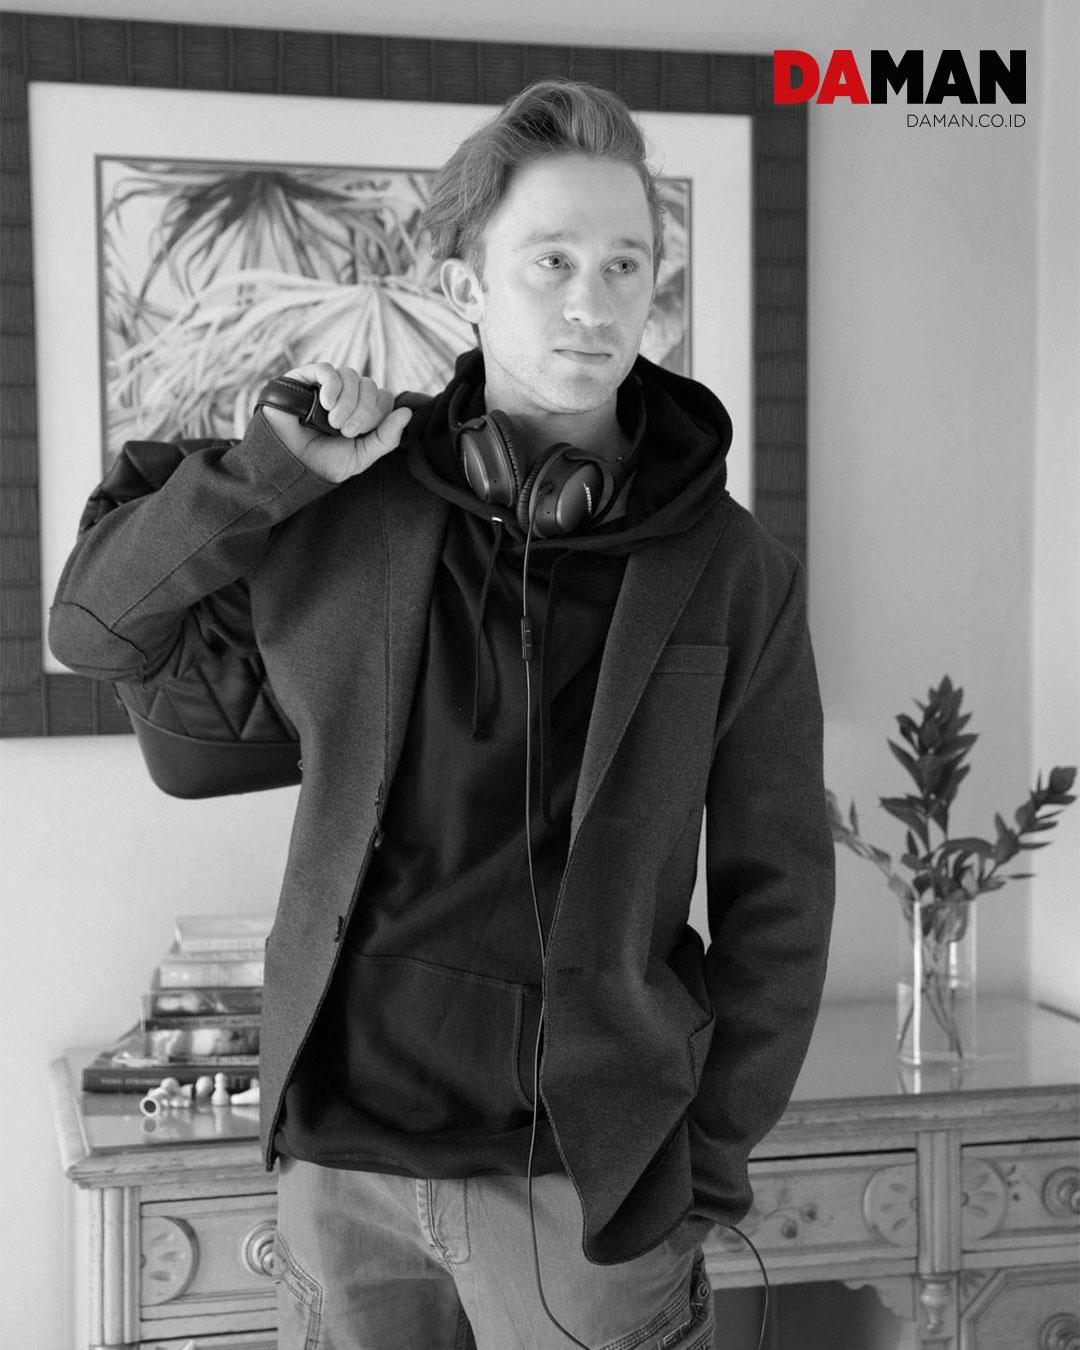 blazer by harris Wharf London, hoodie by allsaints, pants by Jetlag, bag by Zara, headphones by bose